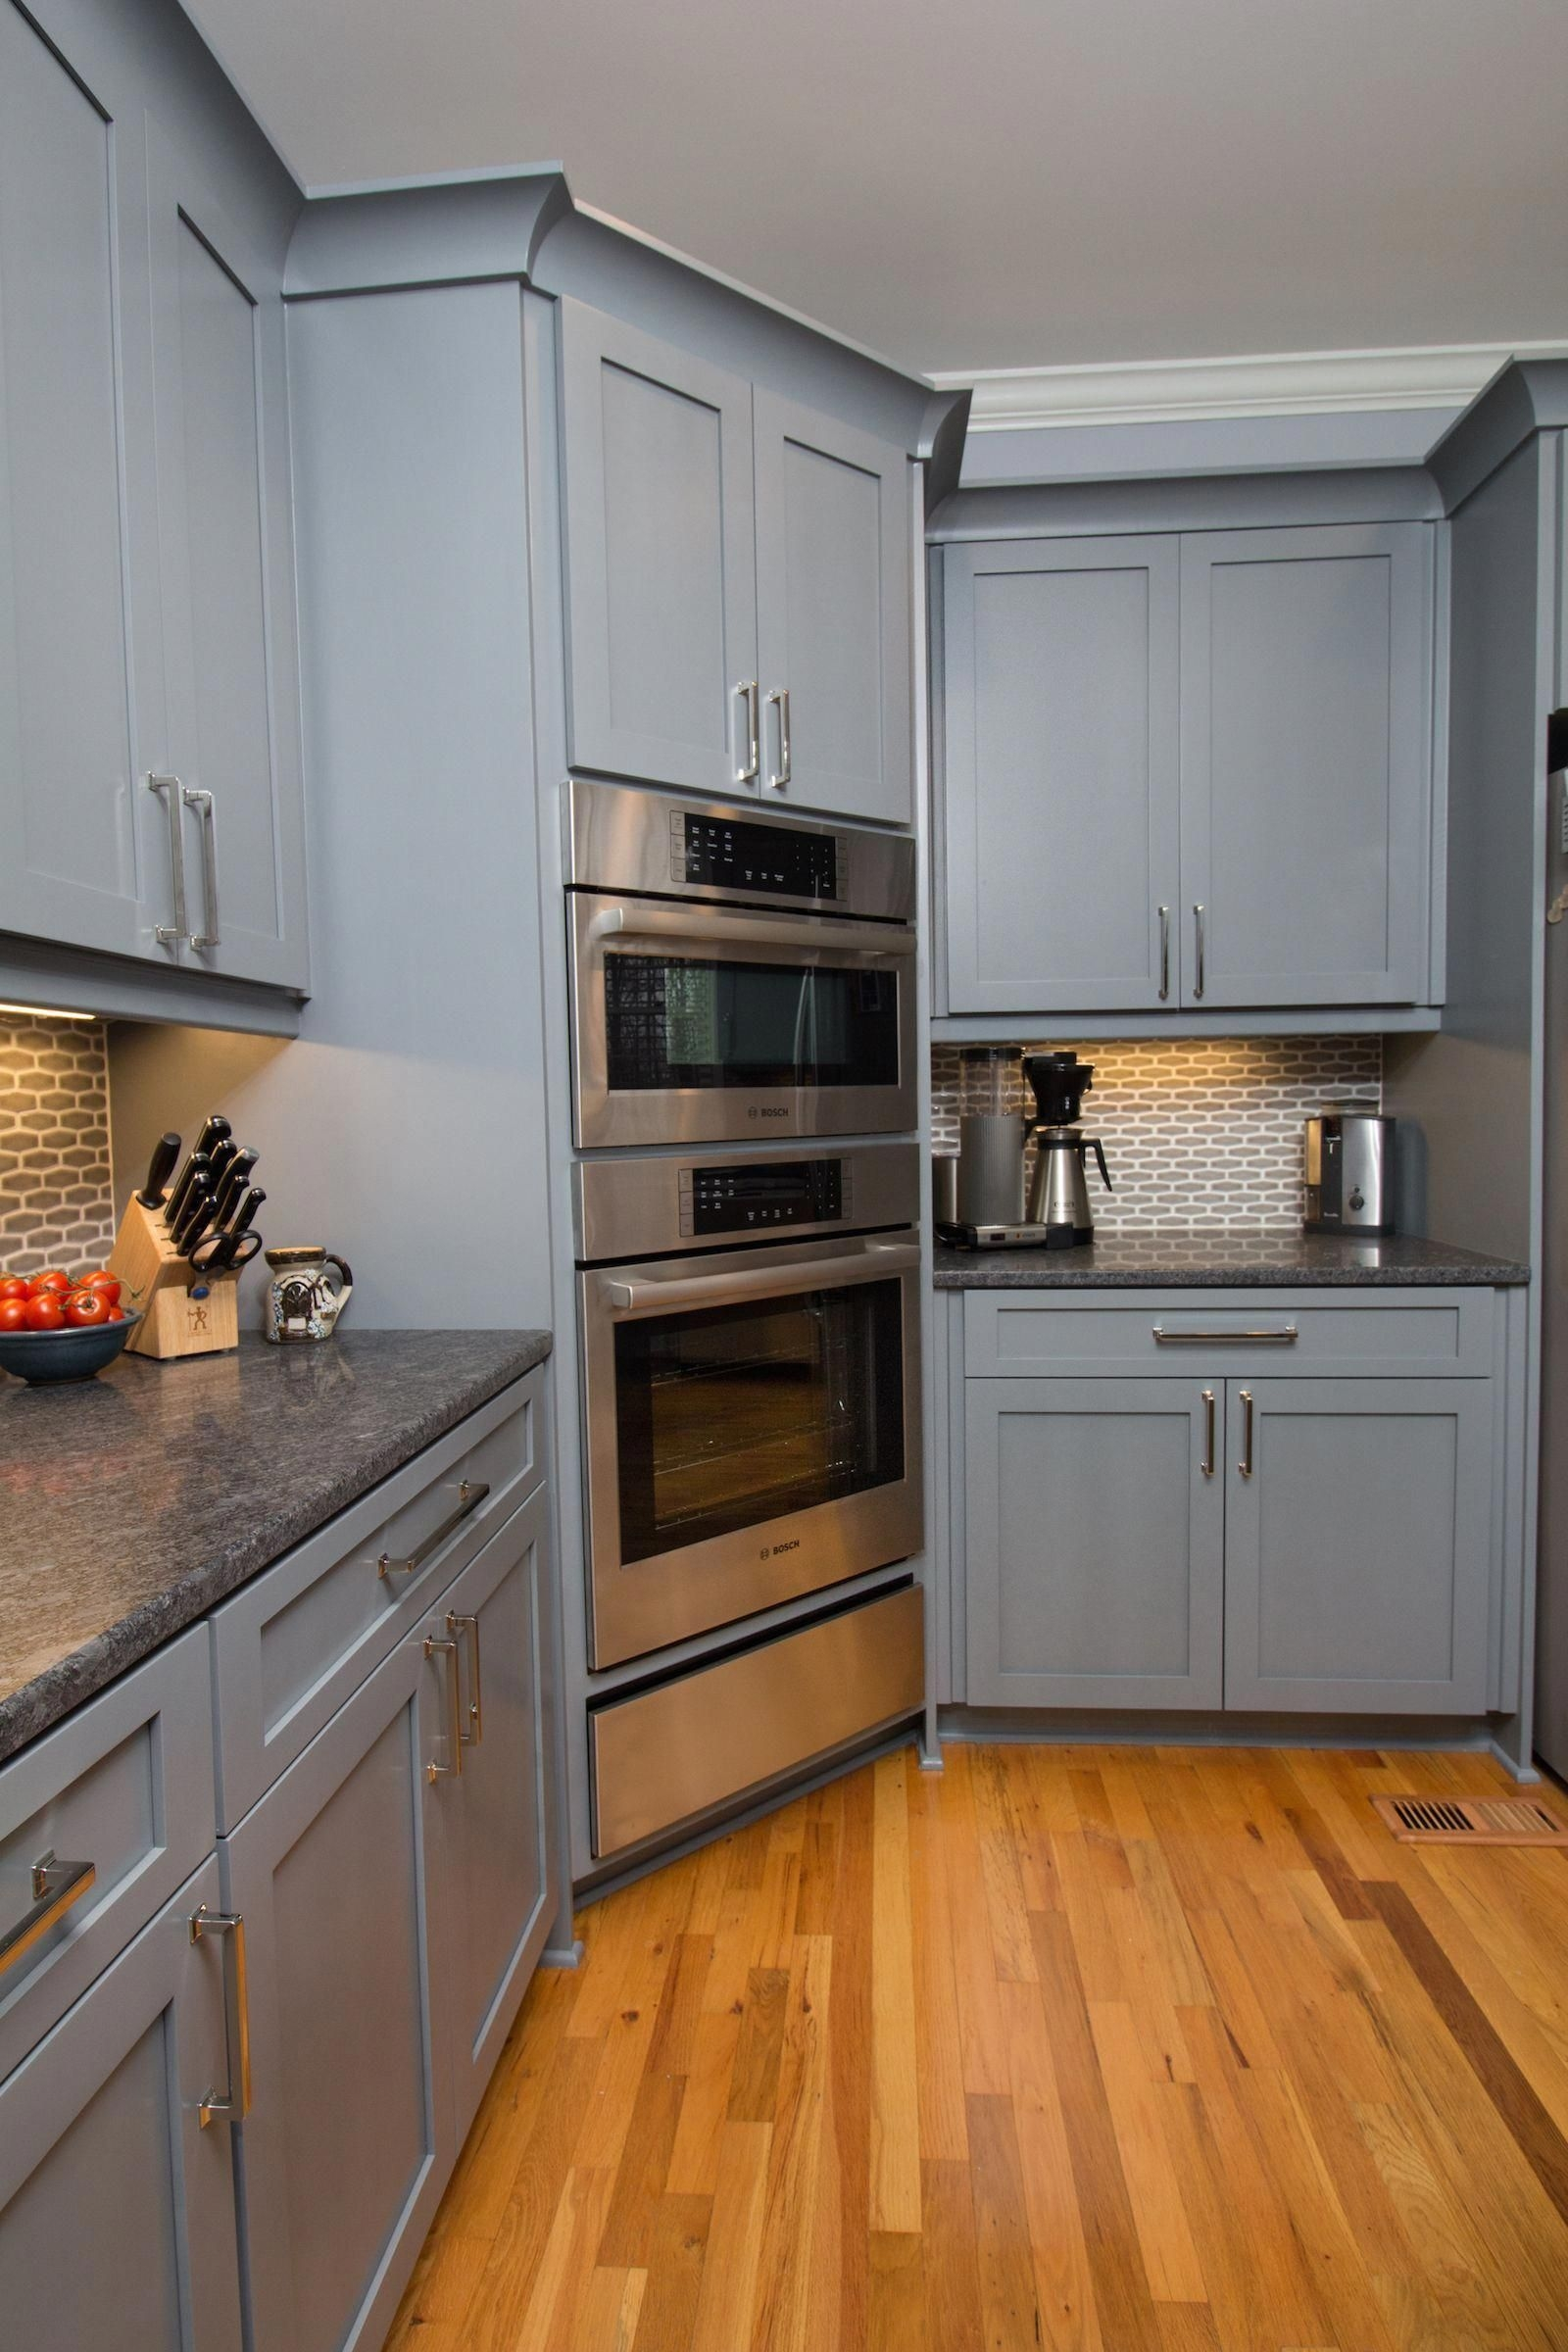 Admiring Granite Kitchen Countertops Ideas That You Shouldnt Miss08